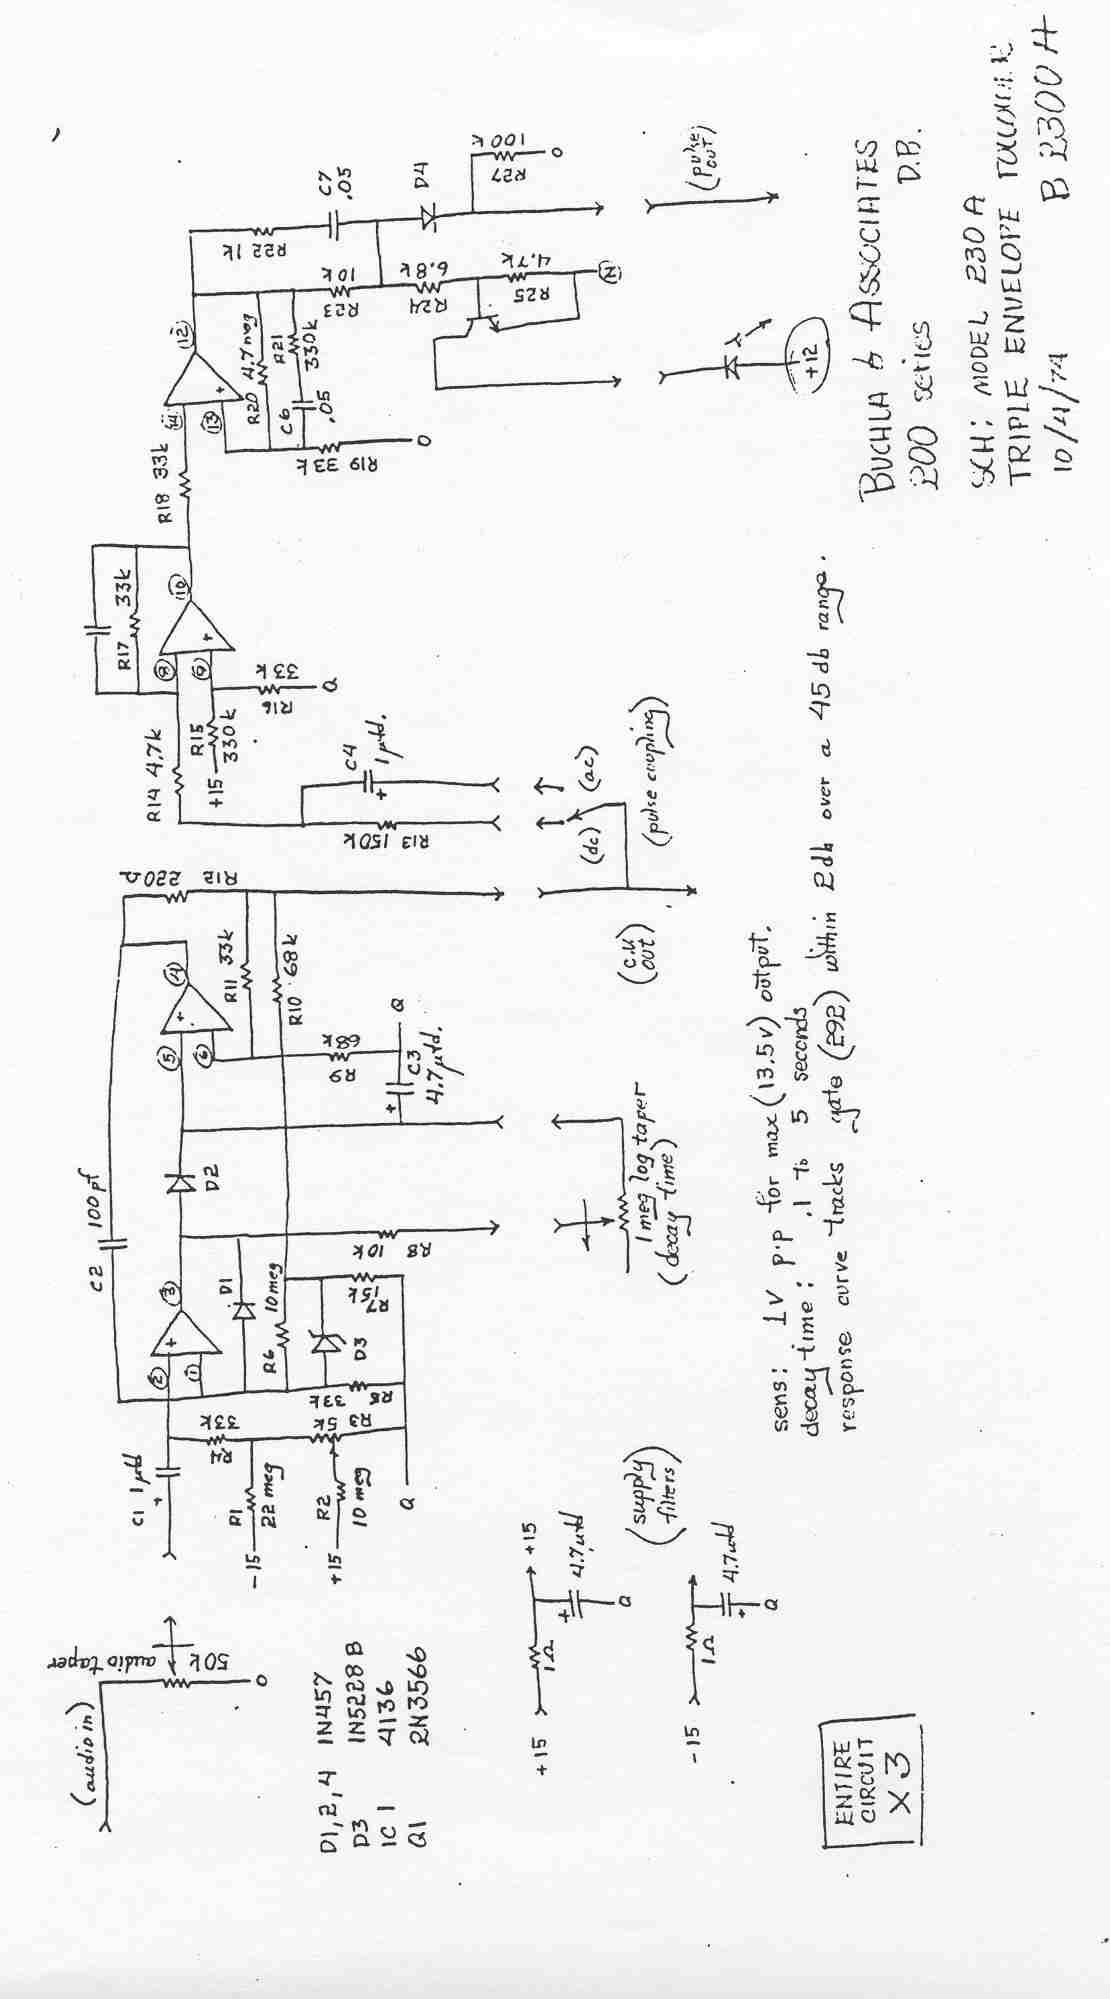 Audio Electronic Circuit Schematics Page 7 Noiseguide Envelope Schematic Buchla 230 Module